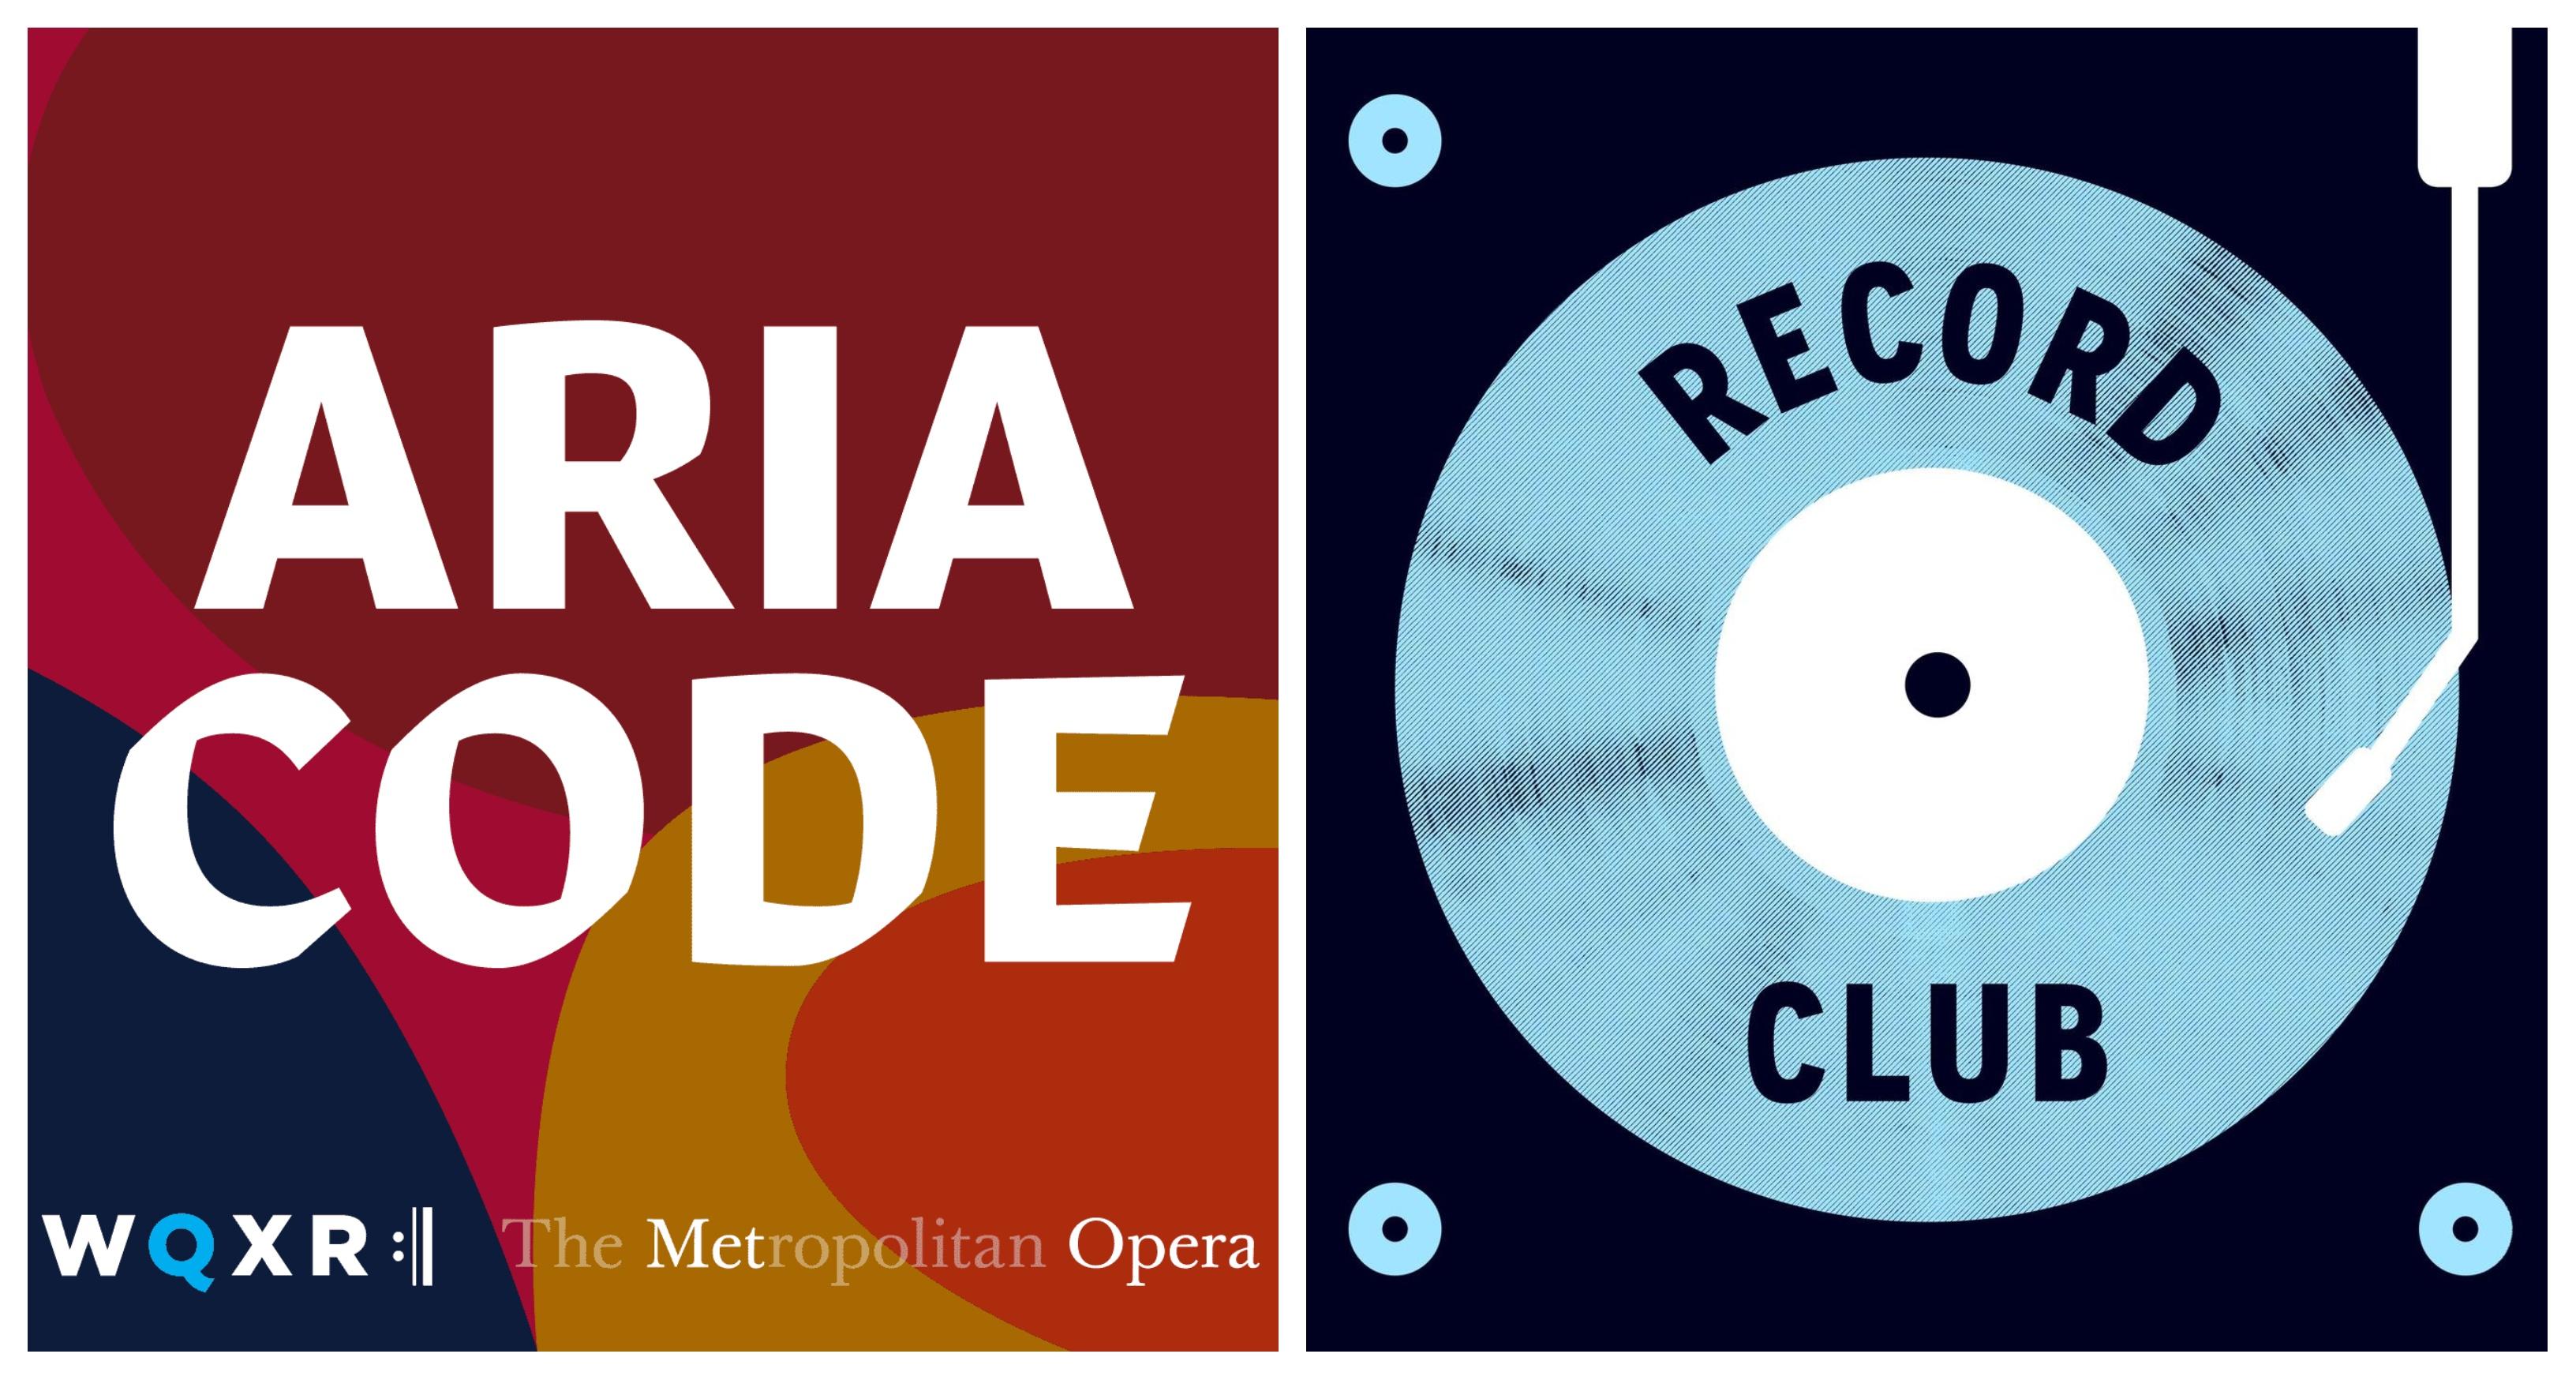 Aria Code - Record Club